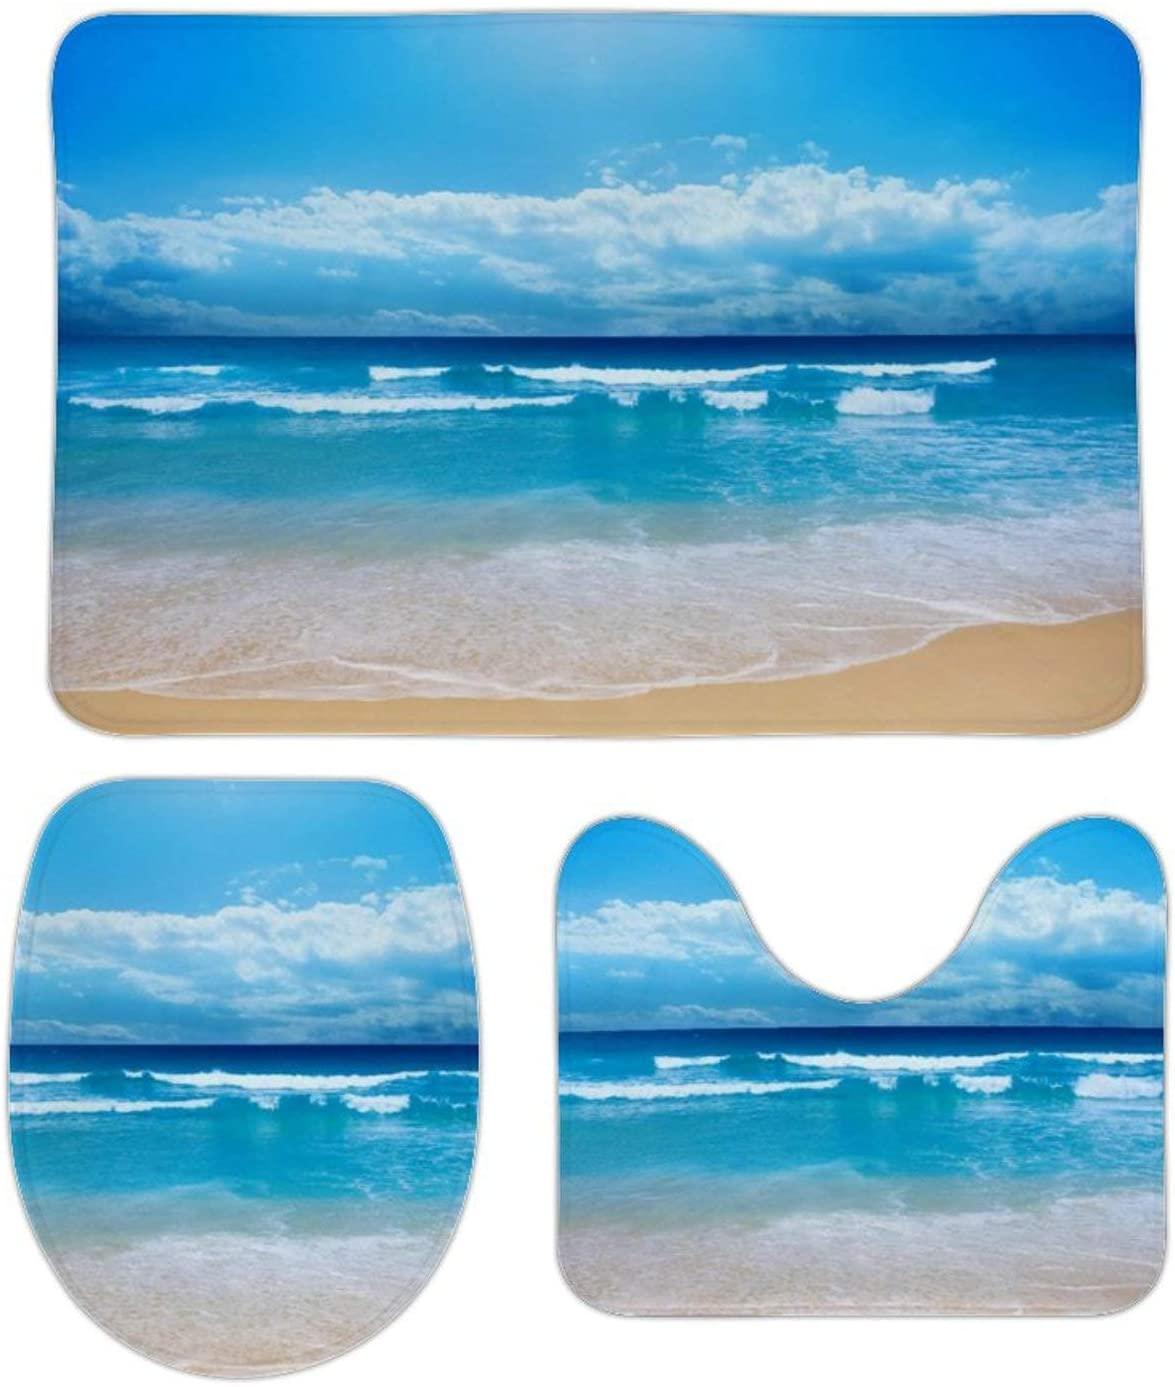 Ocean Beach Blue 3 Pieces Bathroom Rugs Set,Includes U-Shaped Contour Toilet Mat,Bath Mat and Toilet Lid Cover,Non Slip Bath Rugs for Bathroom,Tub,Shower